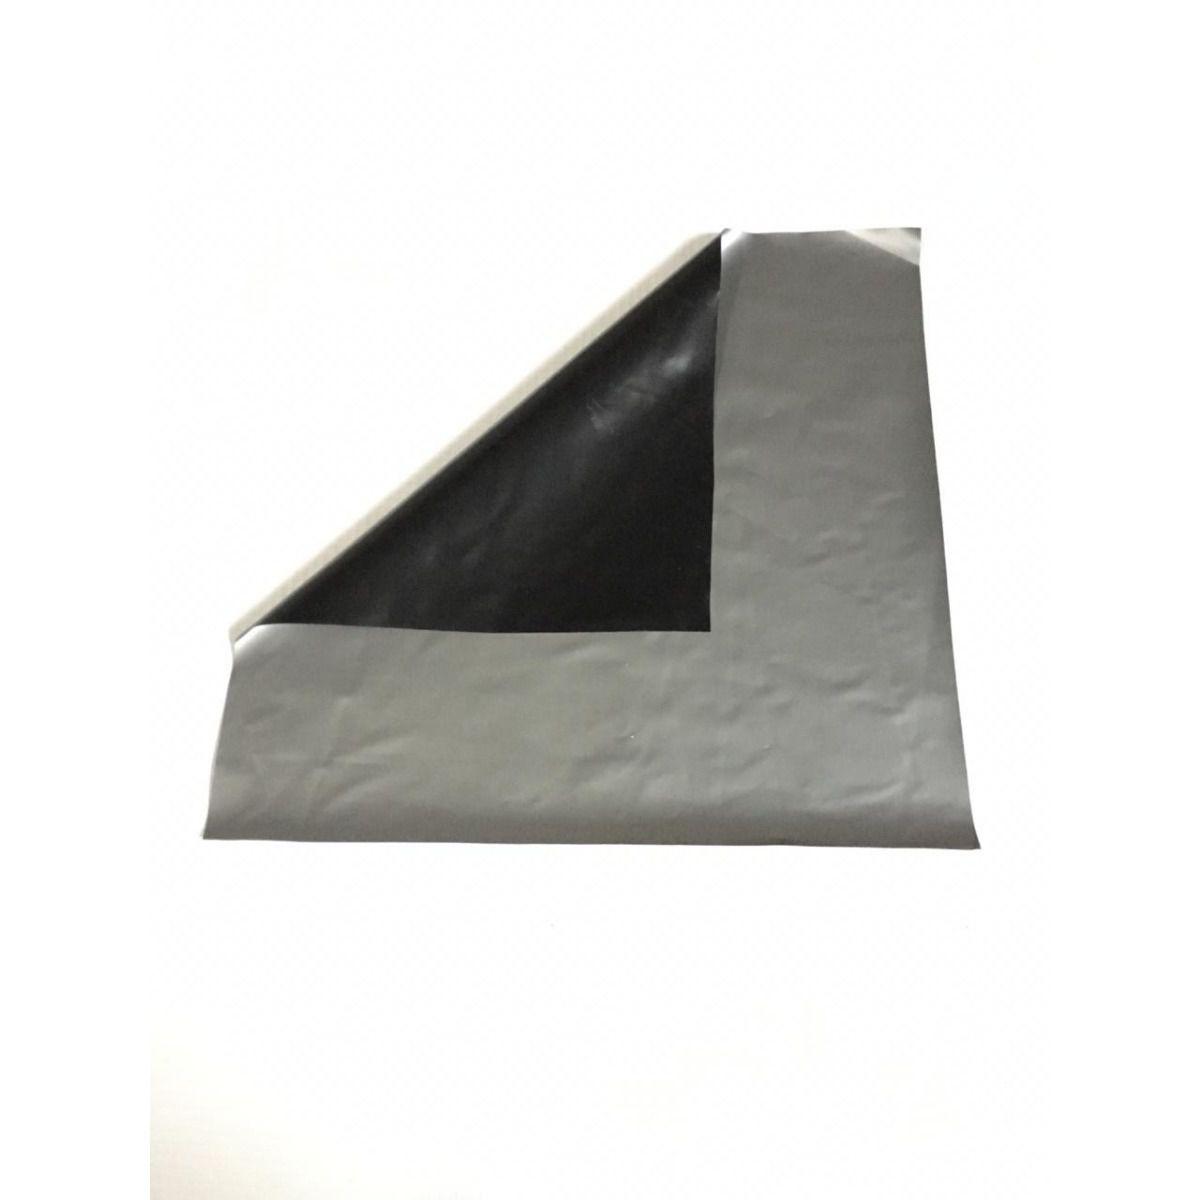 Lona Para Silagem Dupla Face Prata/Preta 10x12 Aprox 150 Mic